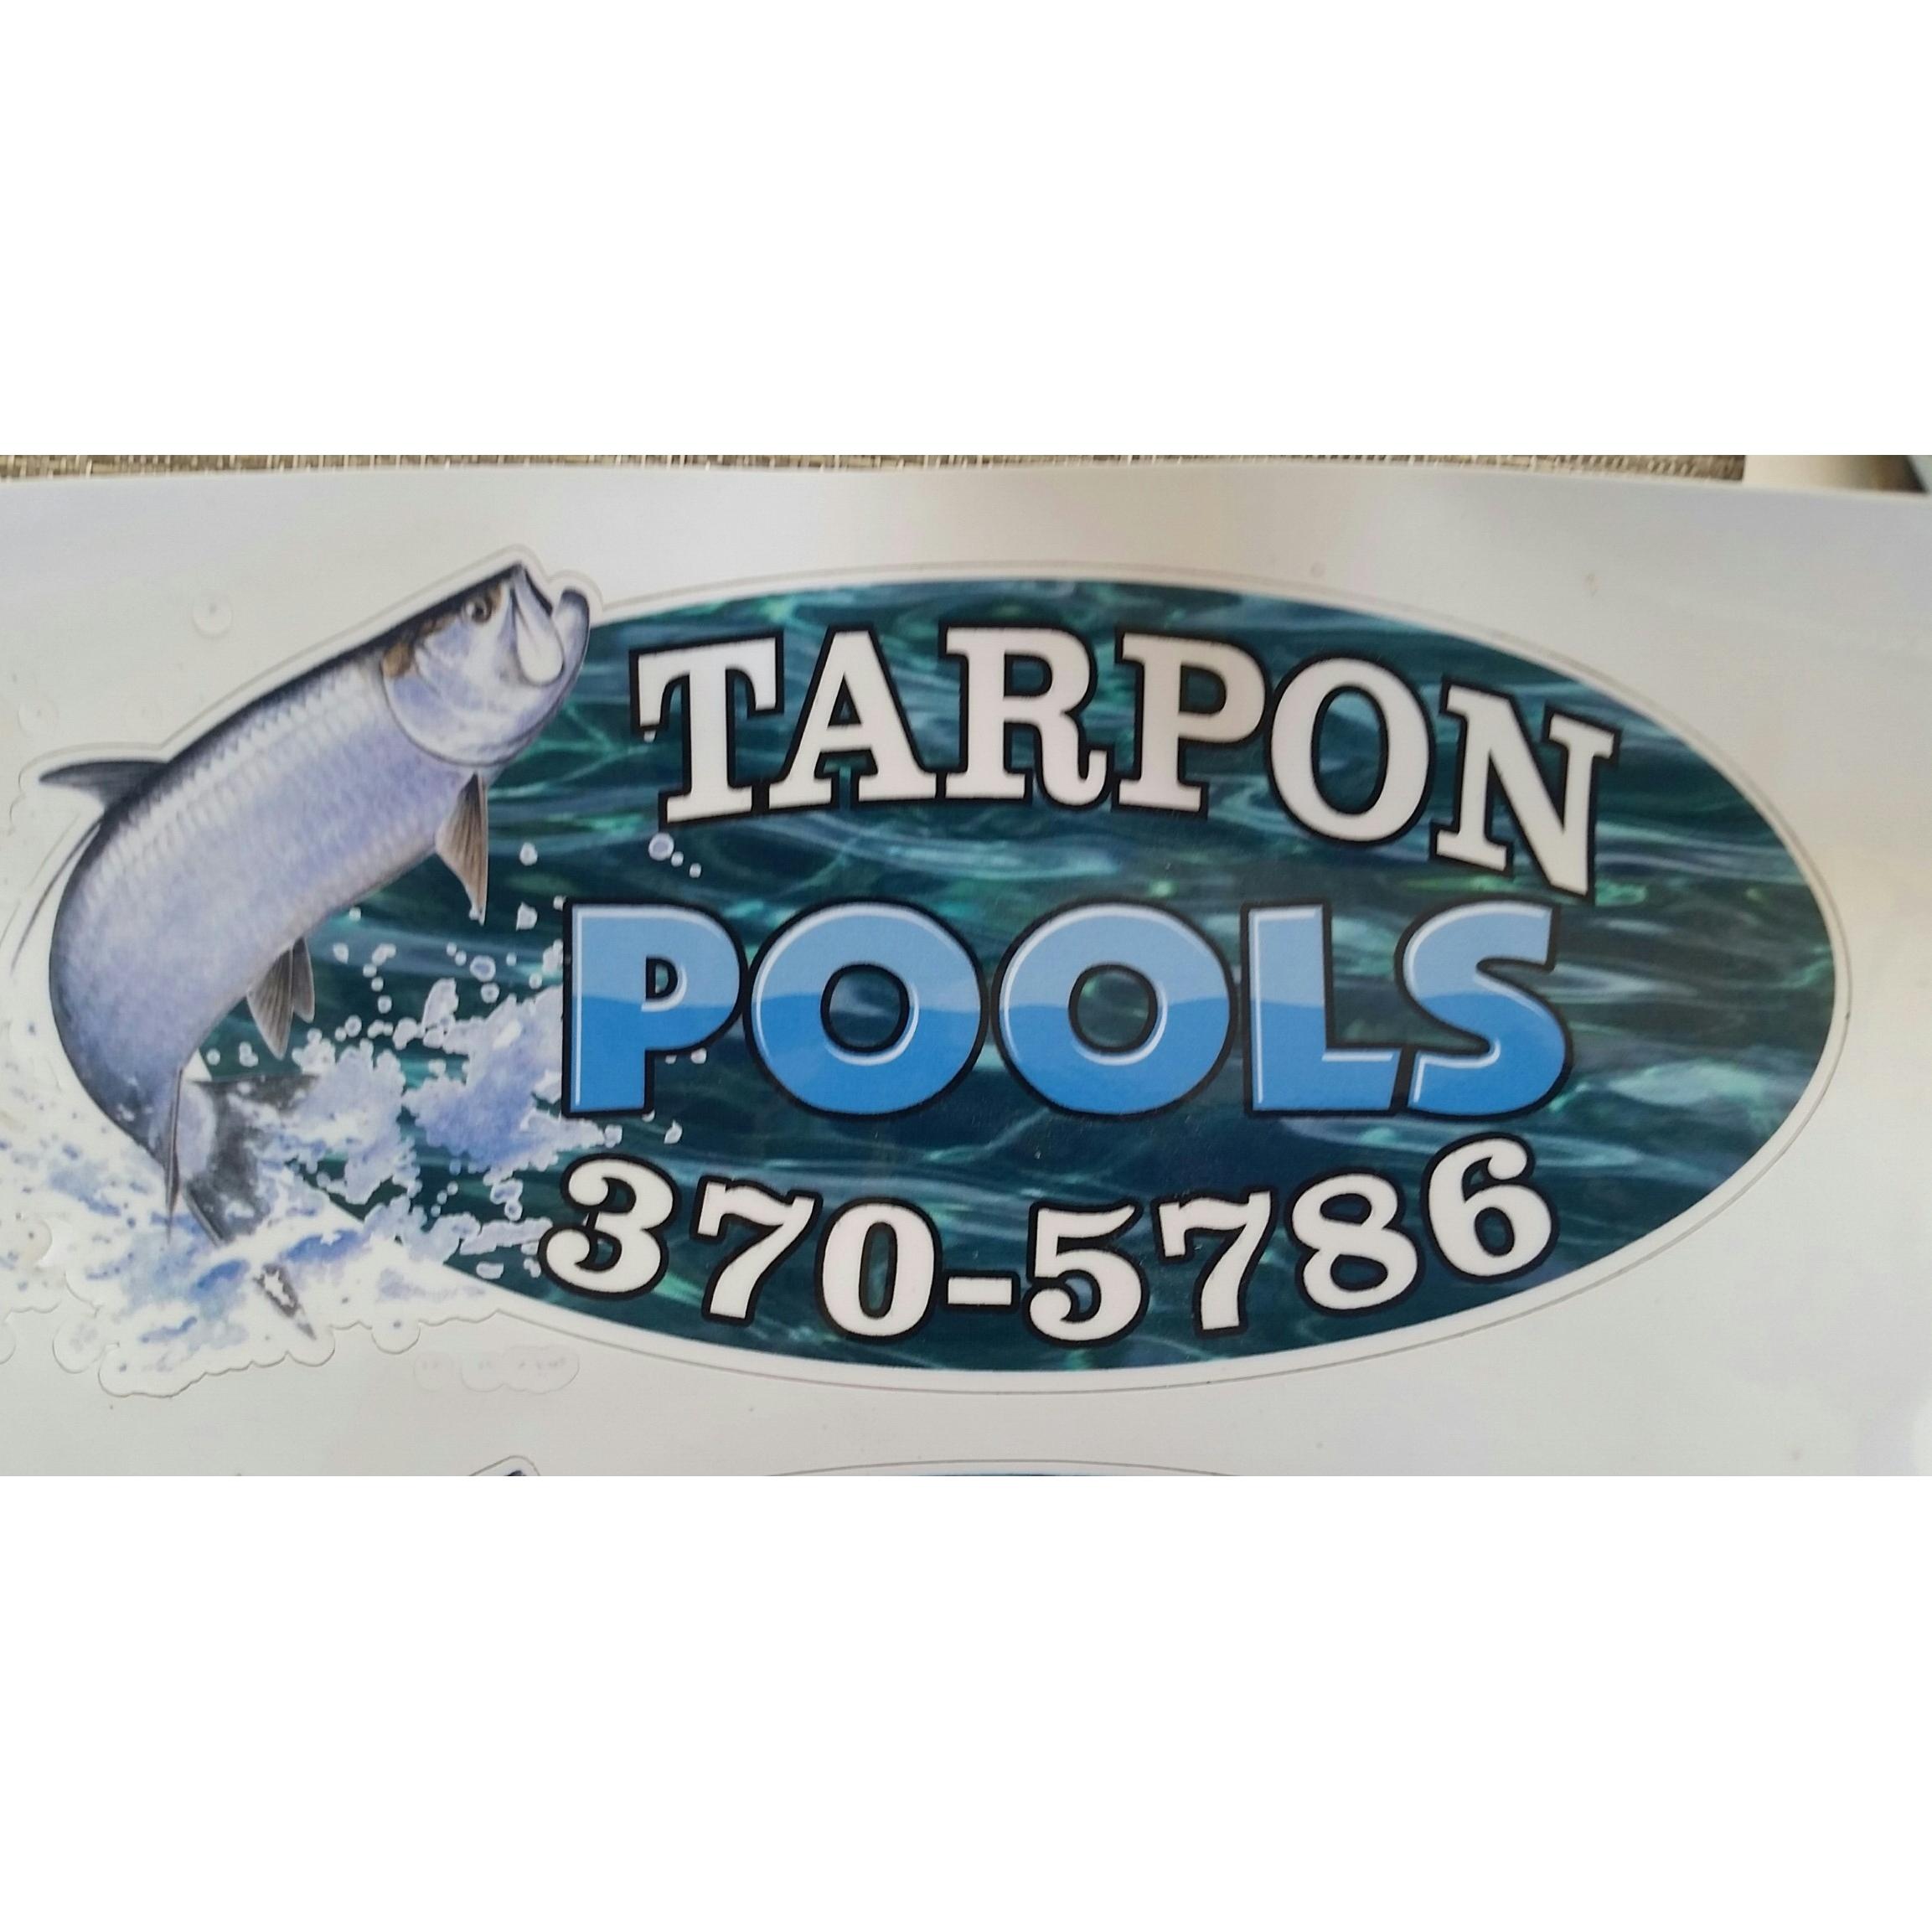 TARPON POOLS AND PATIO SERVICE LLC image 0